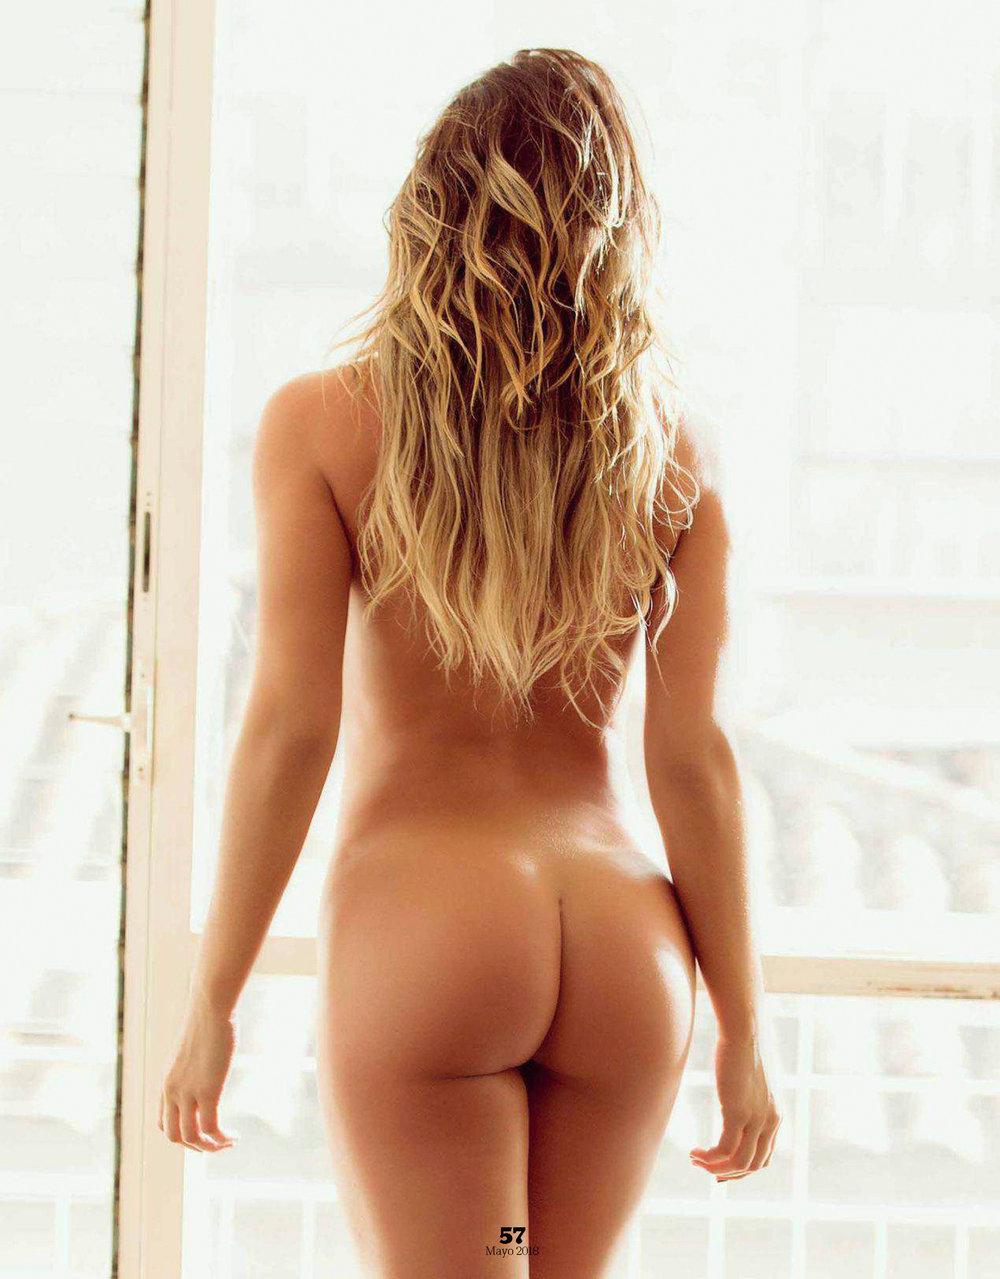 fabitogomez_201805-Playboy México-63.jpg